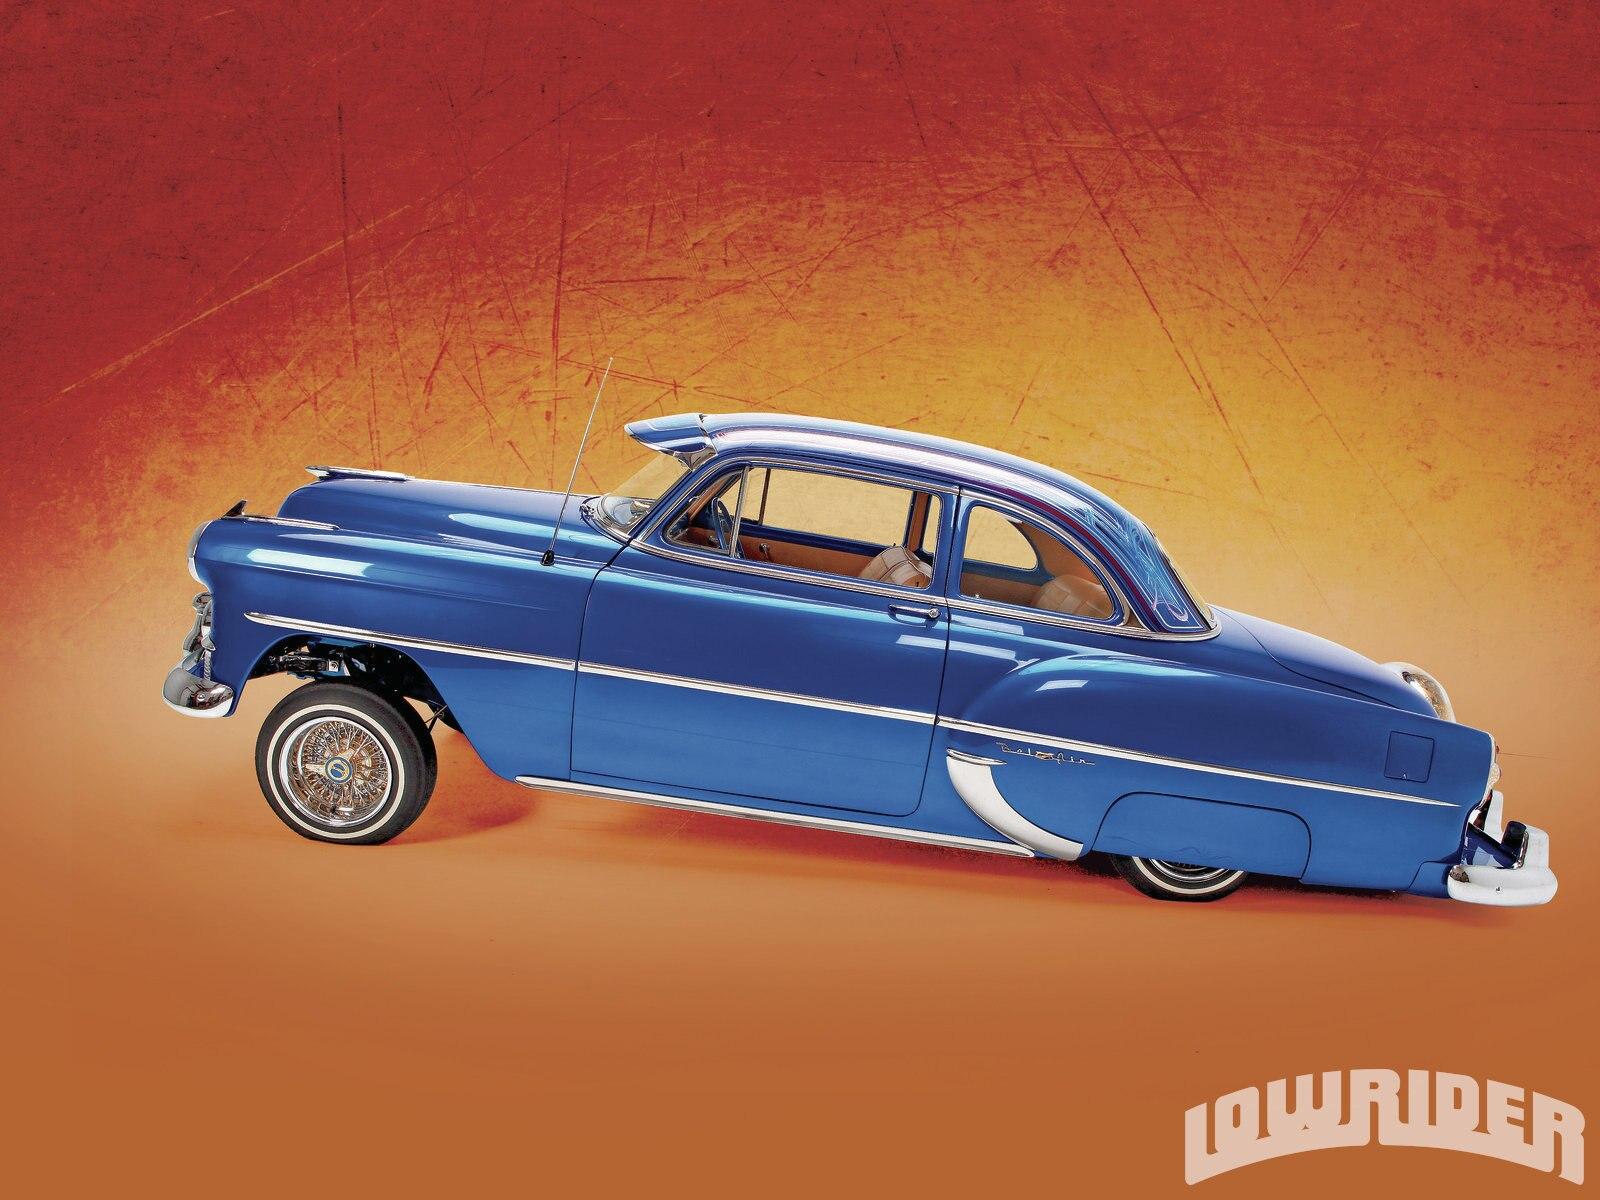 1110-lrmp-10-o-1953-chevrolet-club-coupe-driver-side-profile2